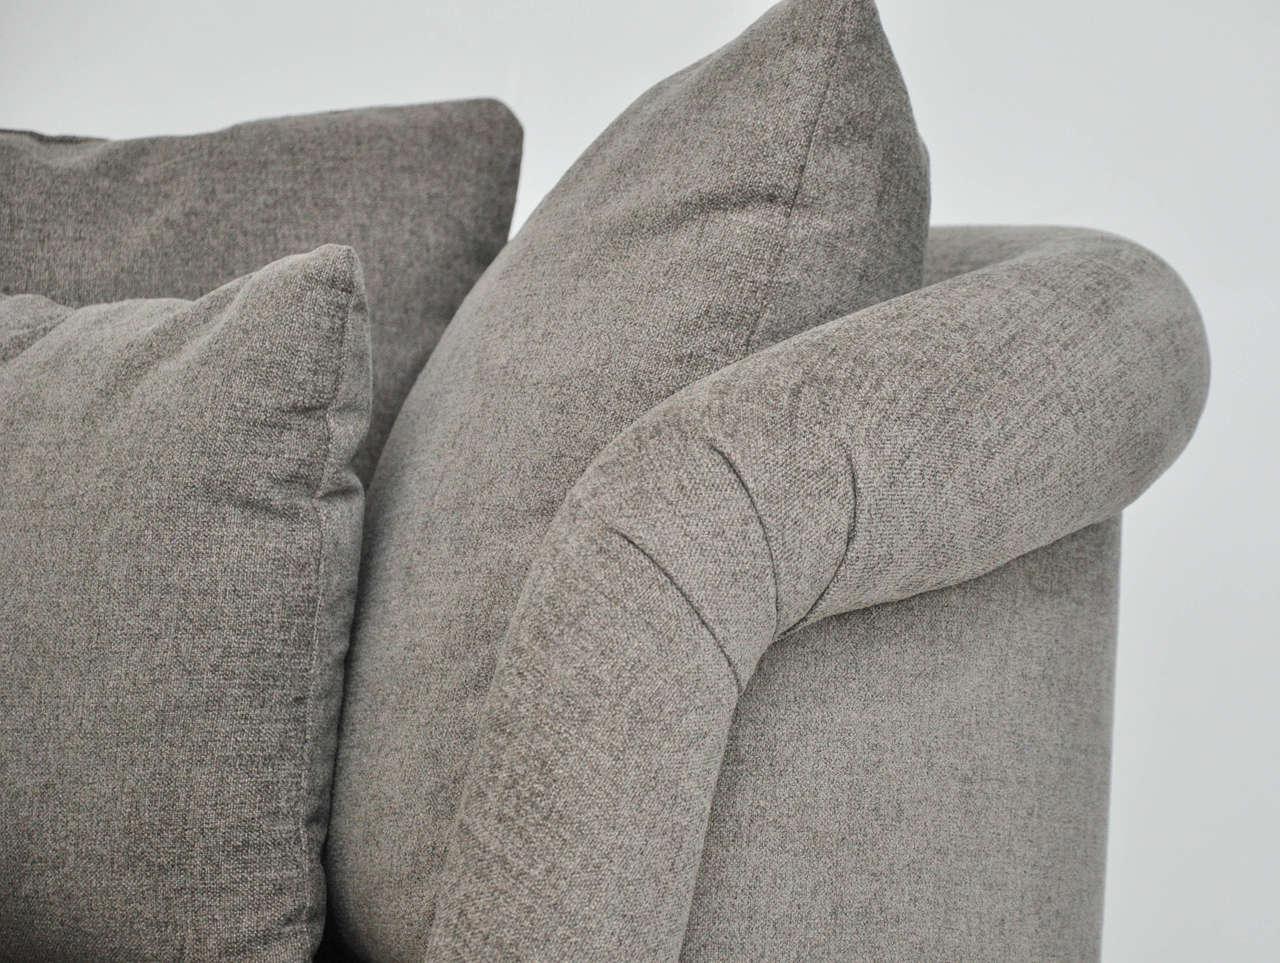 Pair of Large Milo Baughman Swivel Chairs 5